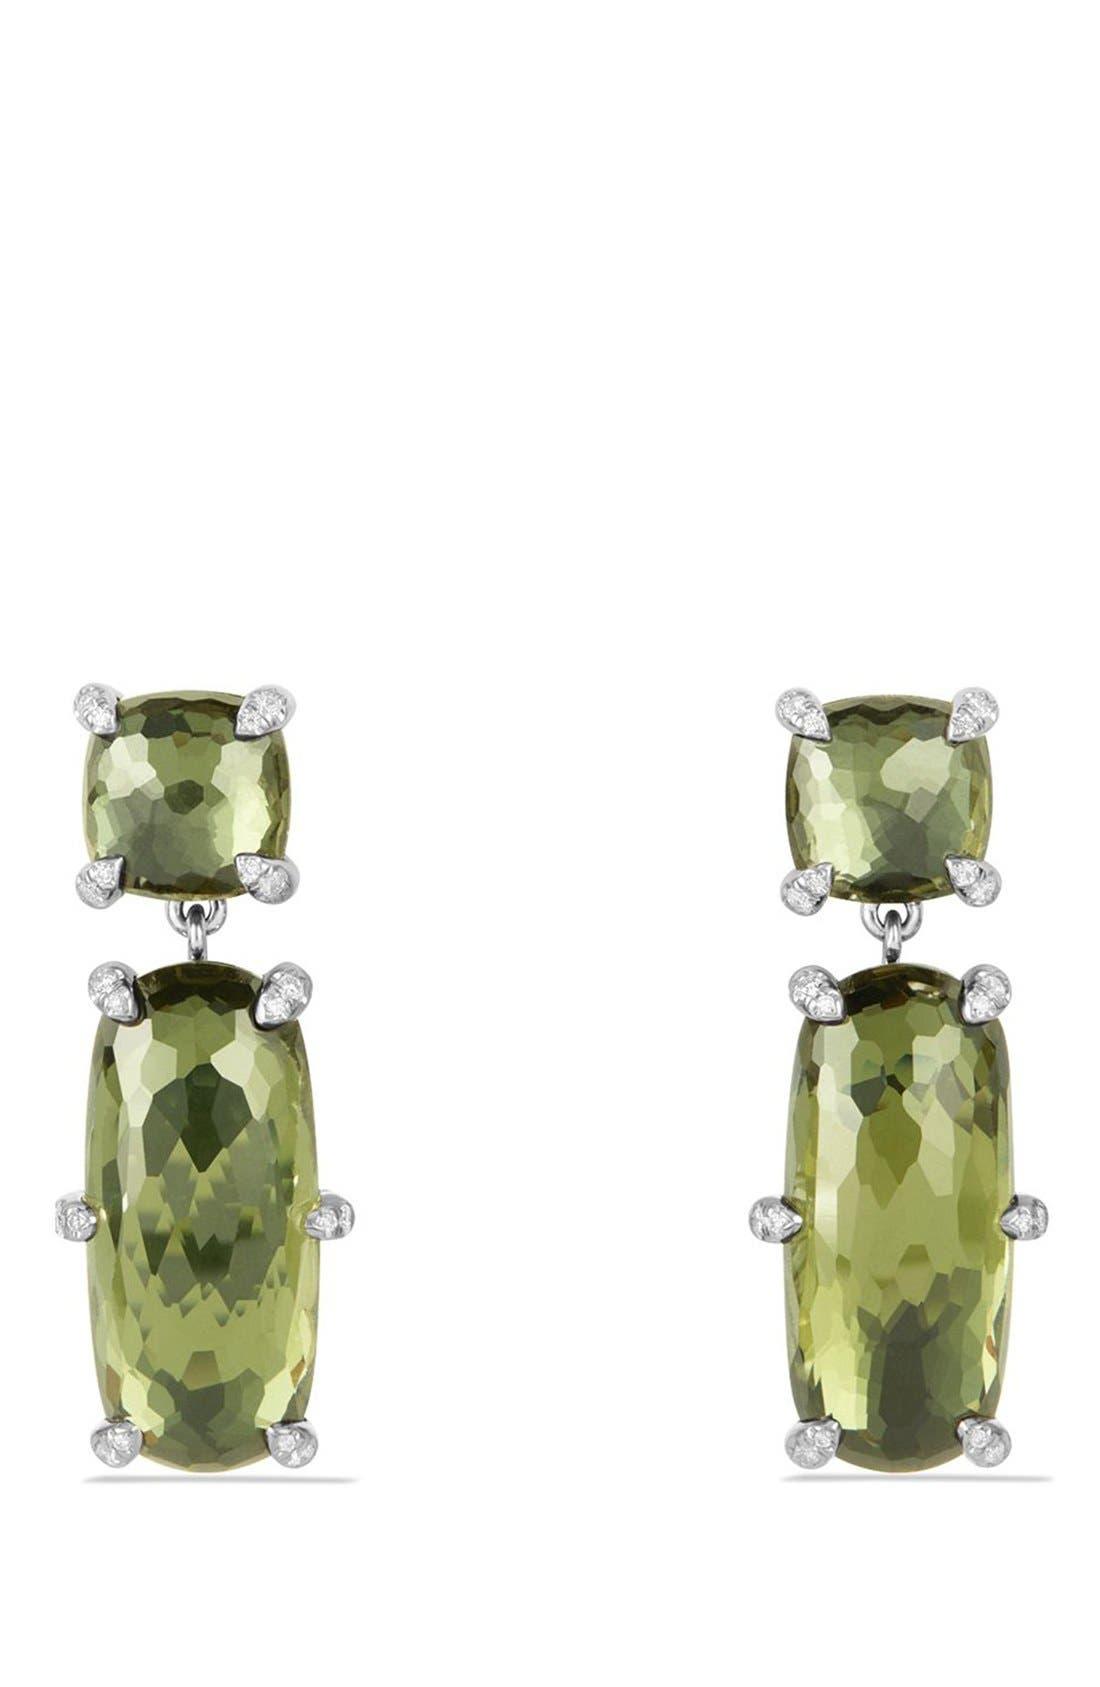 Alternate Image 1 Selected - David Yurman 'Châtelaine' Double Drop Earrings